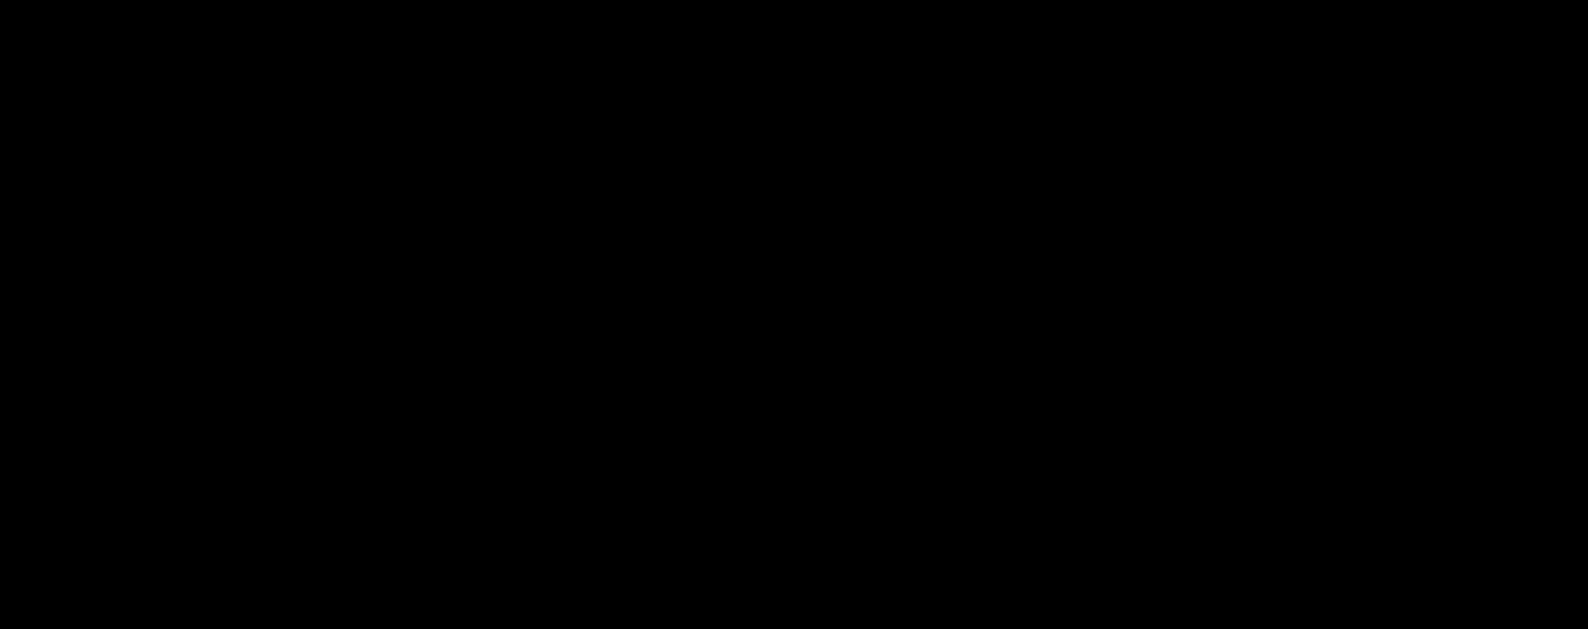 image34.png